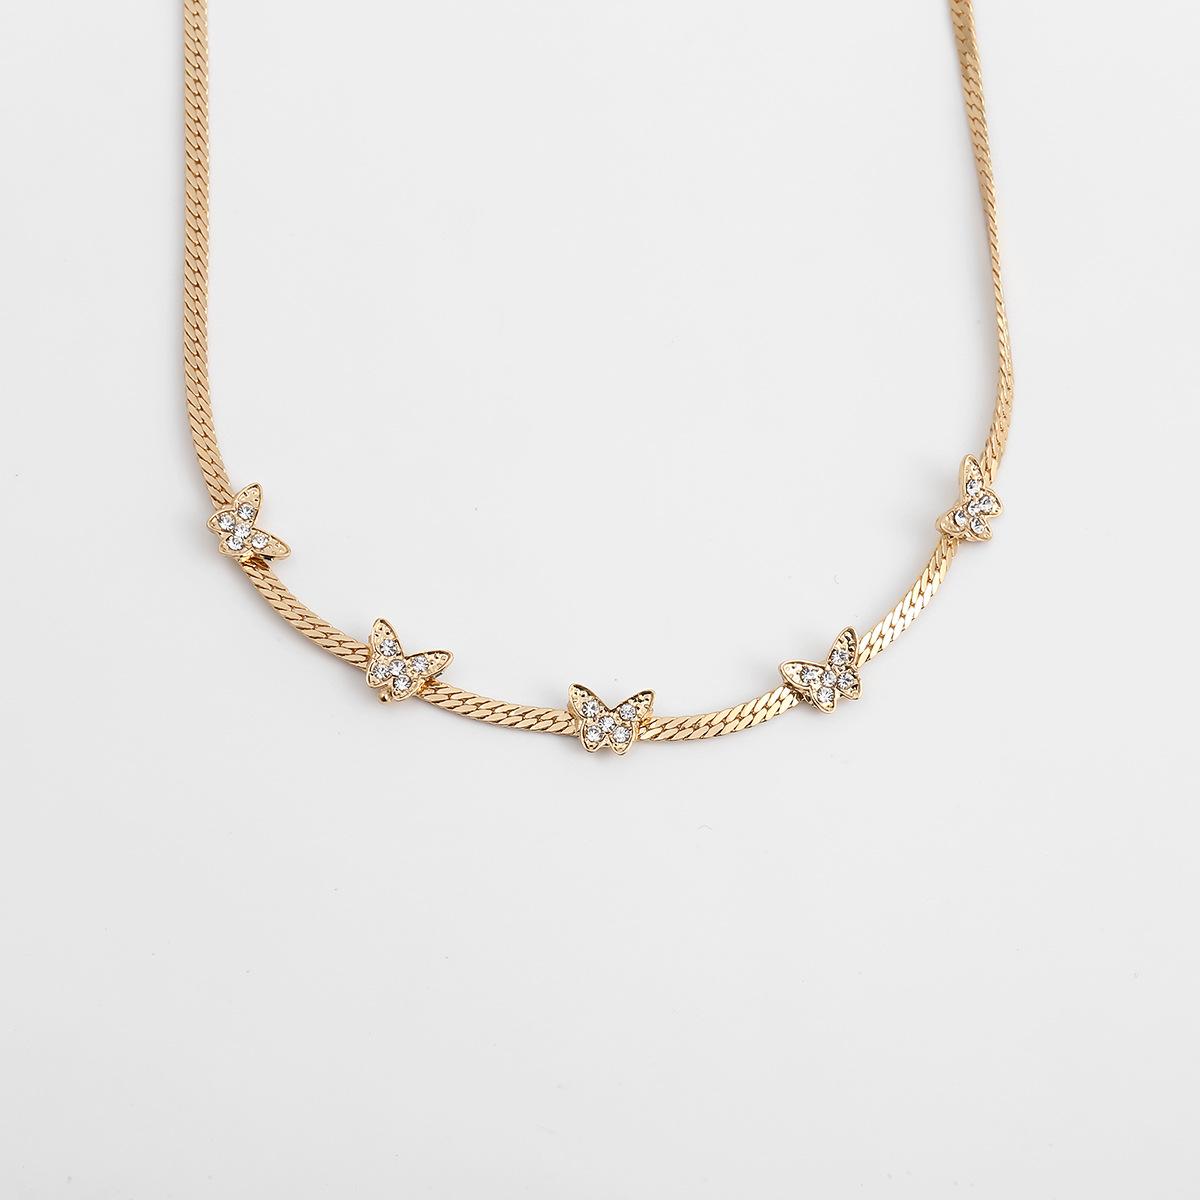 fashion jewelry microset fashion geometric singlelayer necklace temperament short snake bone chain butterfly necklace wholesale nihaojewelry NHXR221318